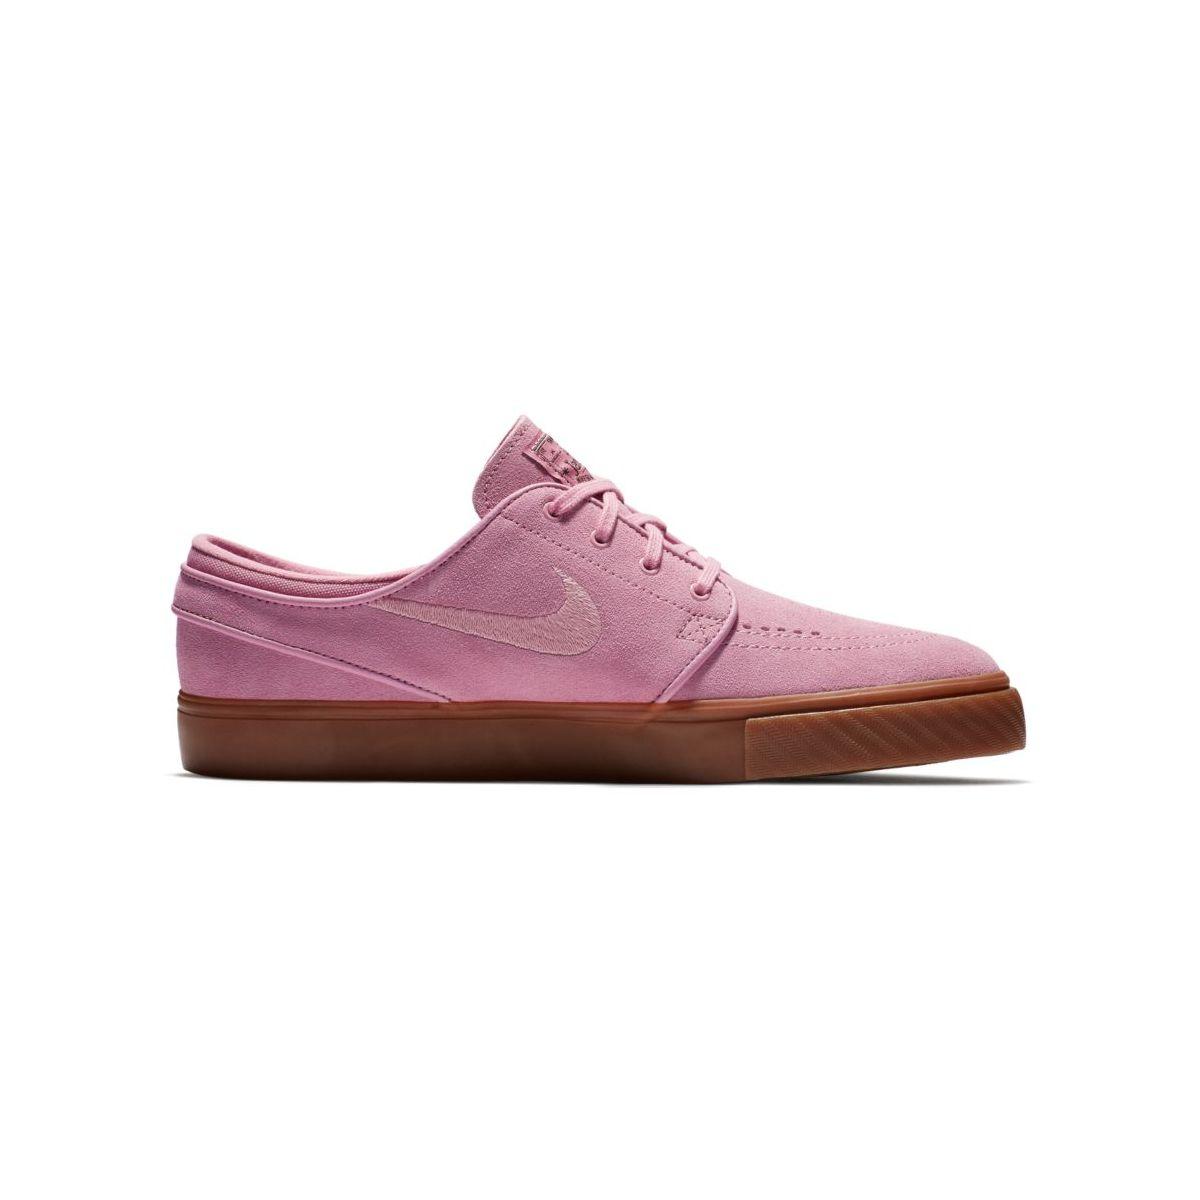 Buty Nike SB Air Zoom Stefan Janoski Elemental Pink / Elemental Pink-Sequoia